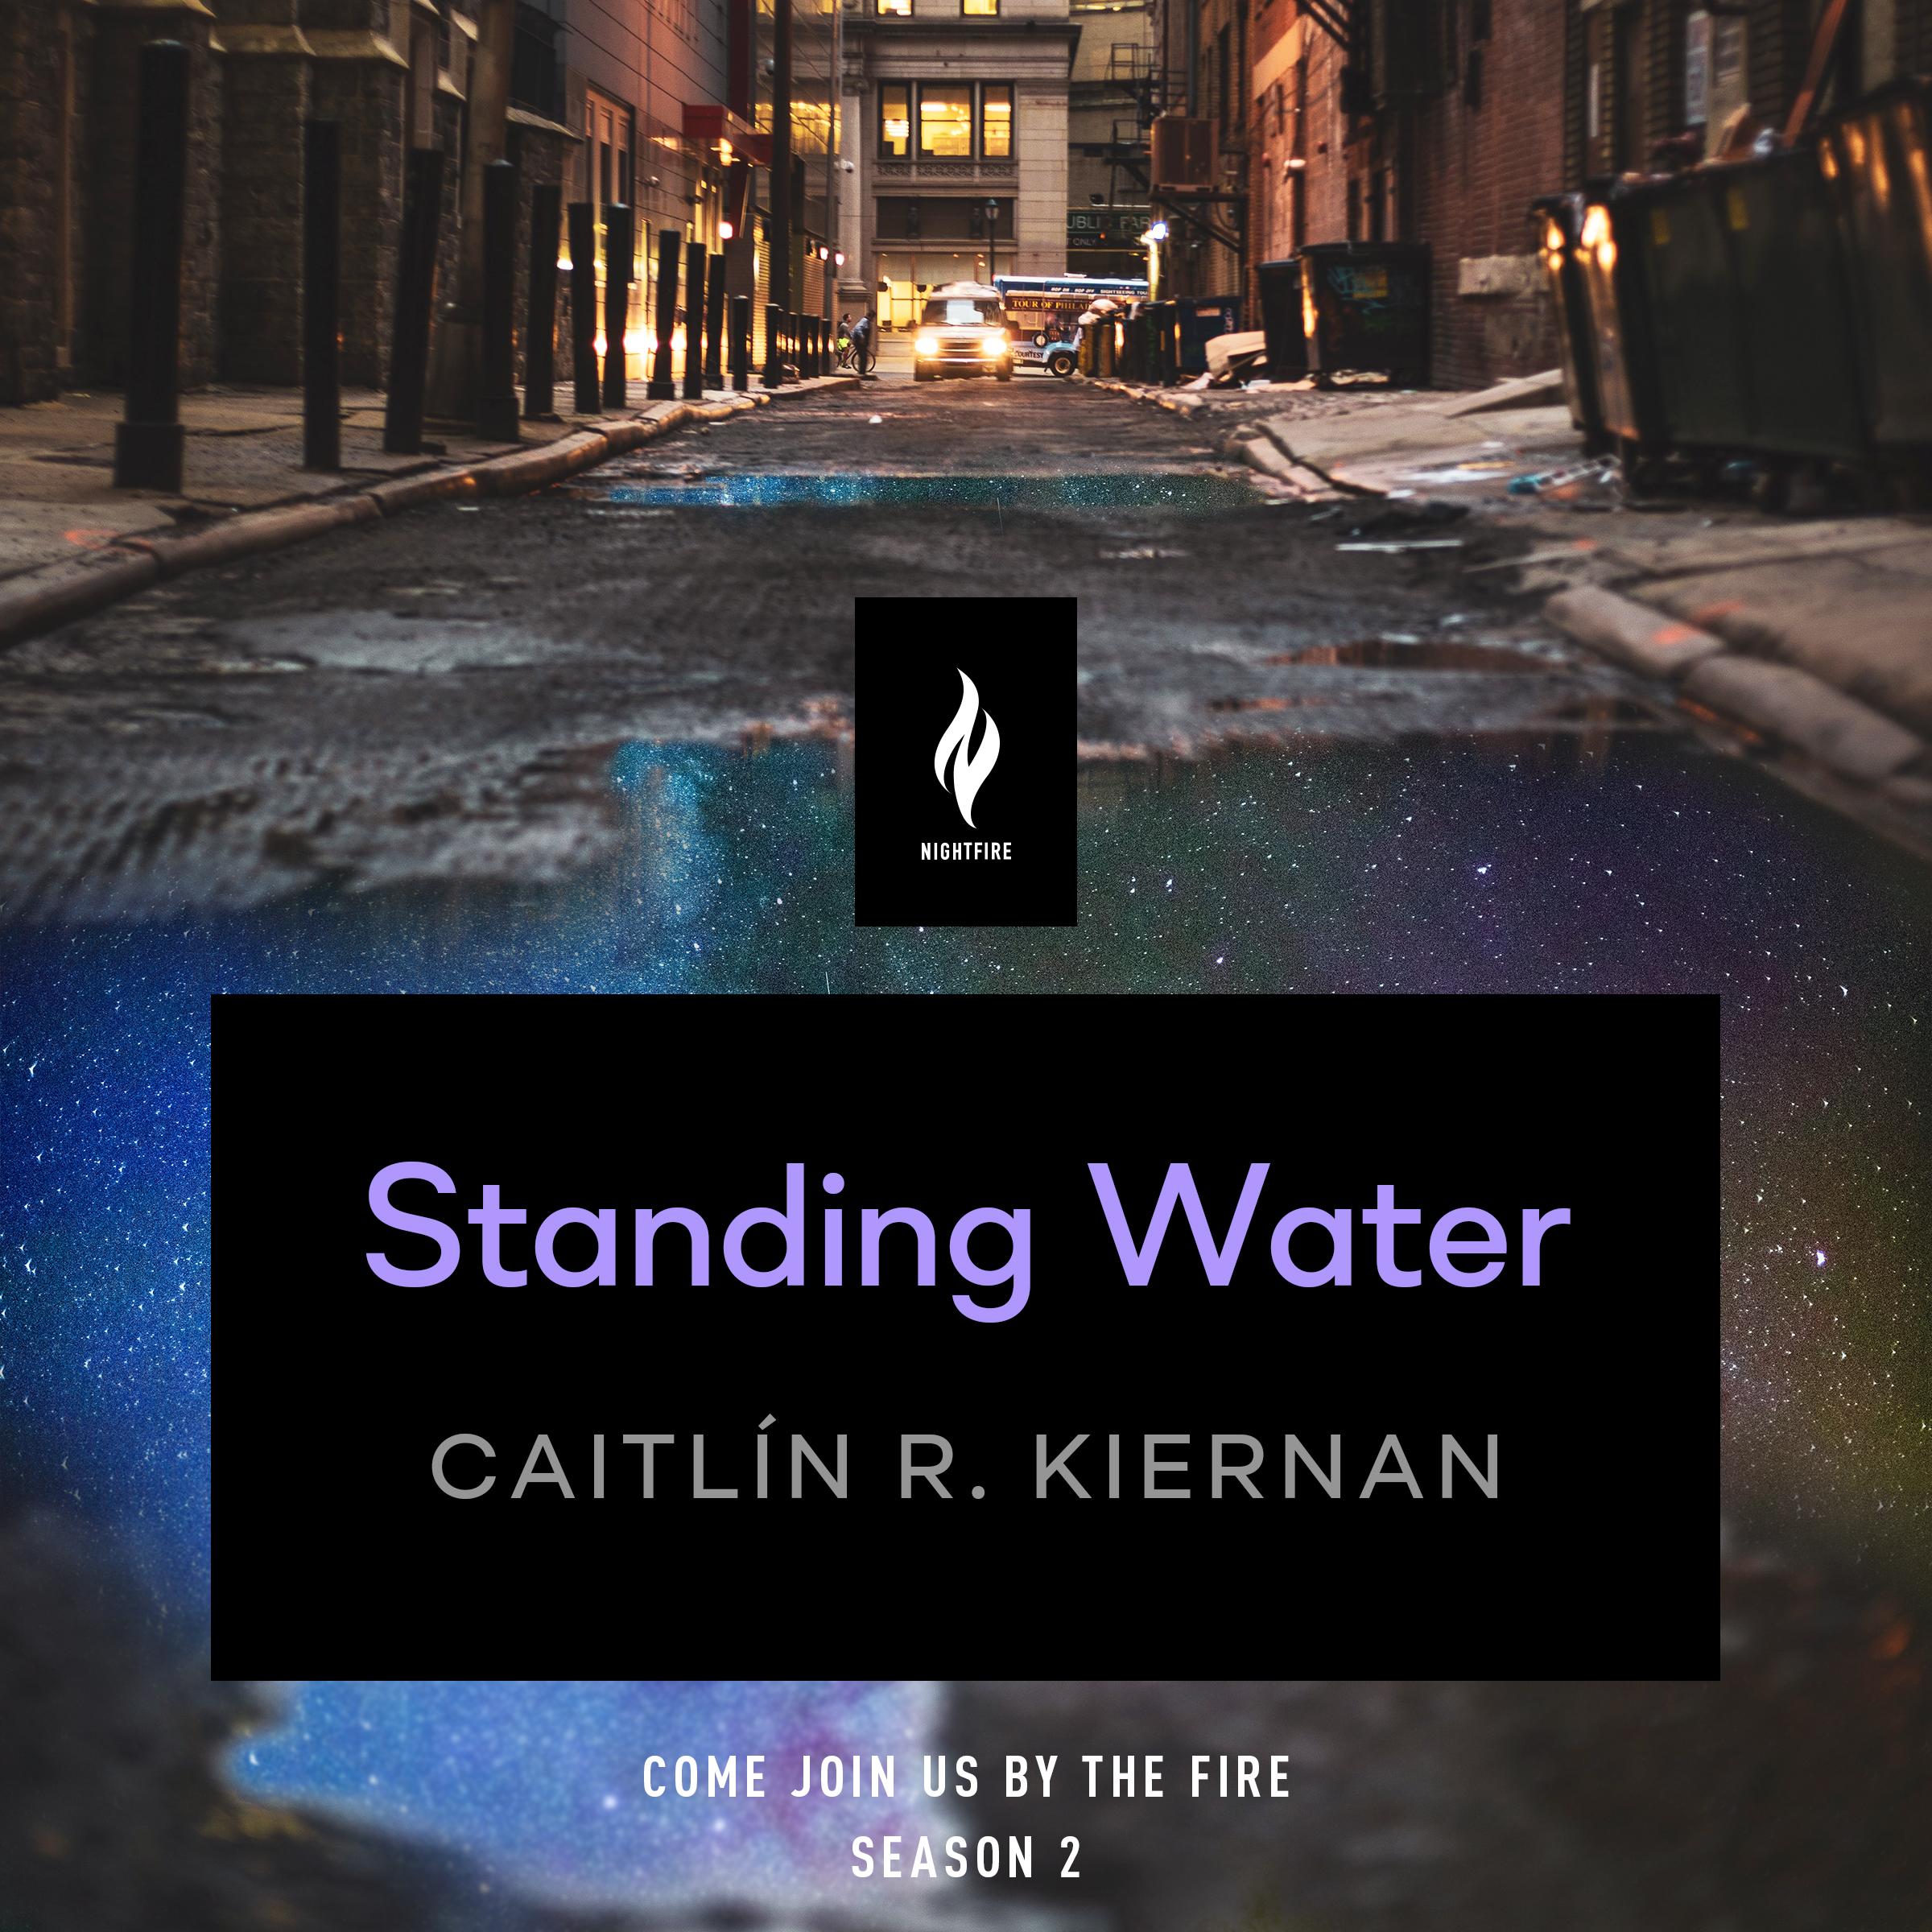 StandingWater_Kiernan